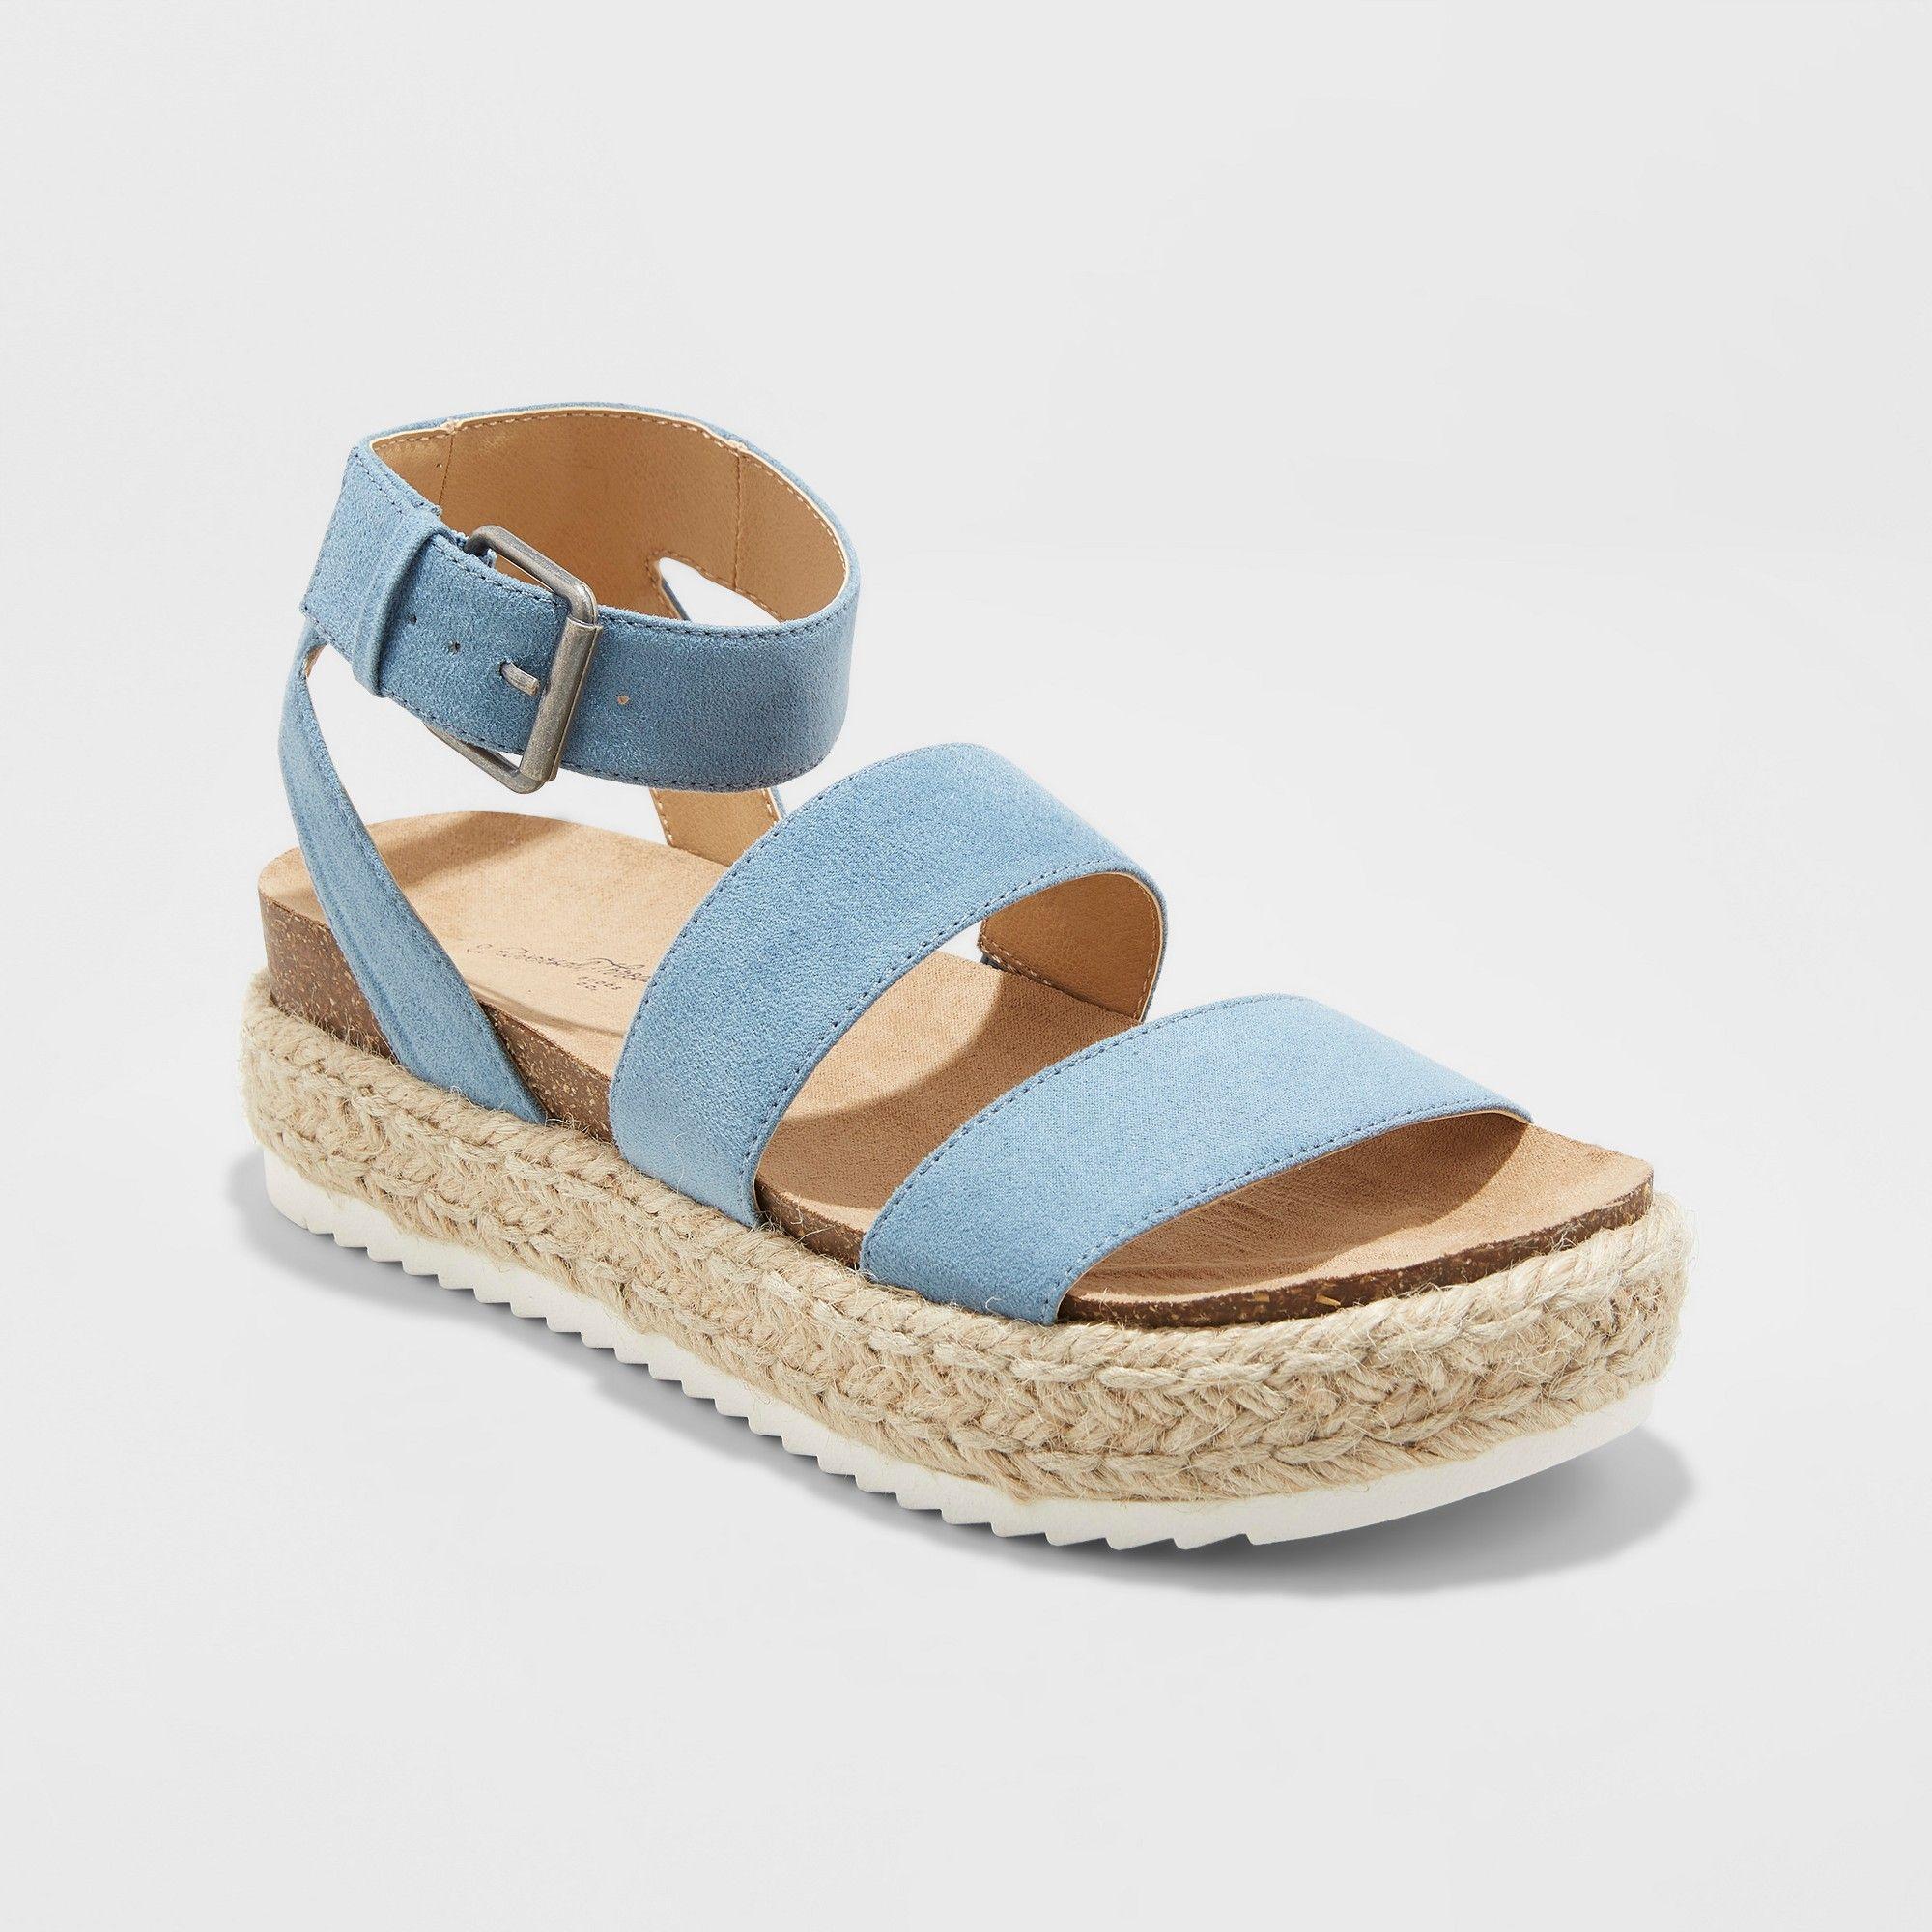 1102b4769a1f Women s Agnes Quarter Strap Espadrille Sandals - Universal Thread Yellow  9.5